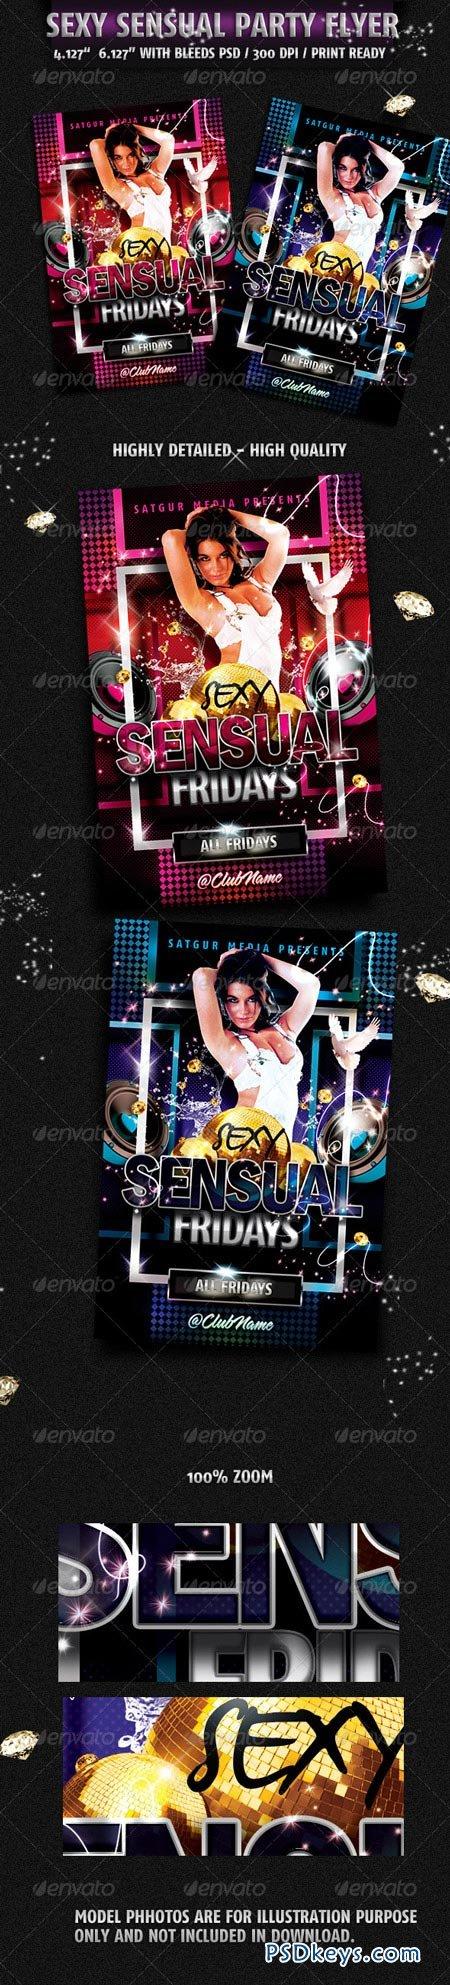 Sensual Music Dance DJ Night Party Flyer 2138436